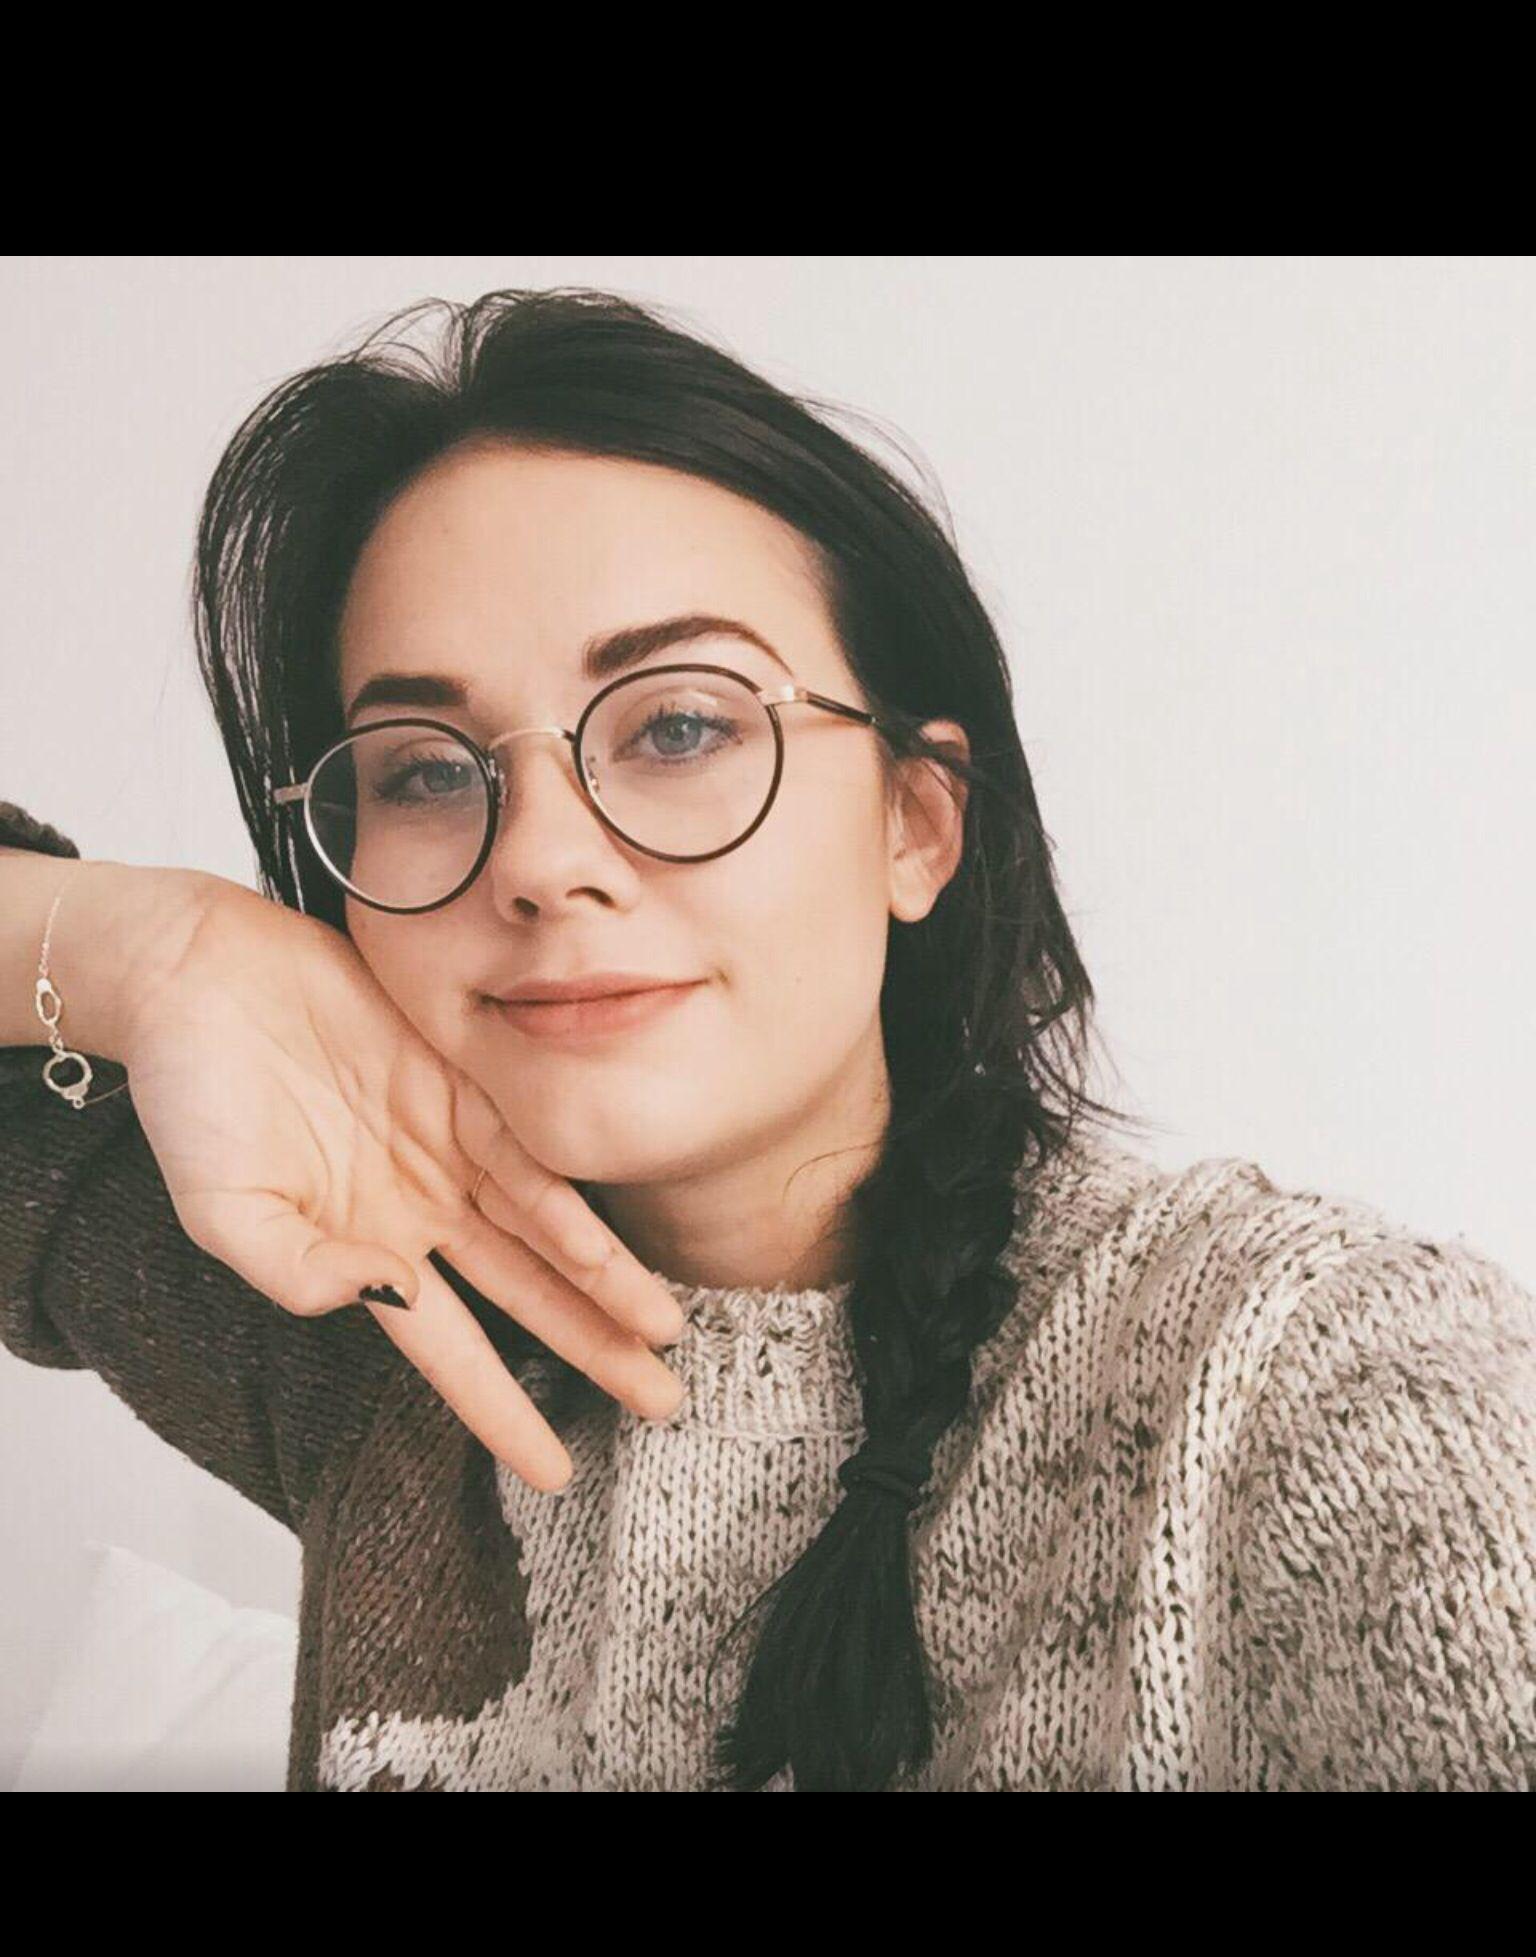 7d492496b6 Love her glasses Gafas De Sol, Lentes Mujer, Chicas Con Lentes, Fotos Con